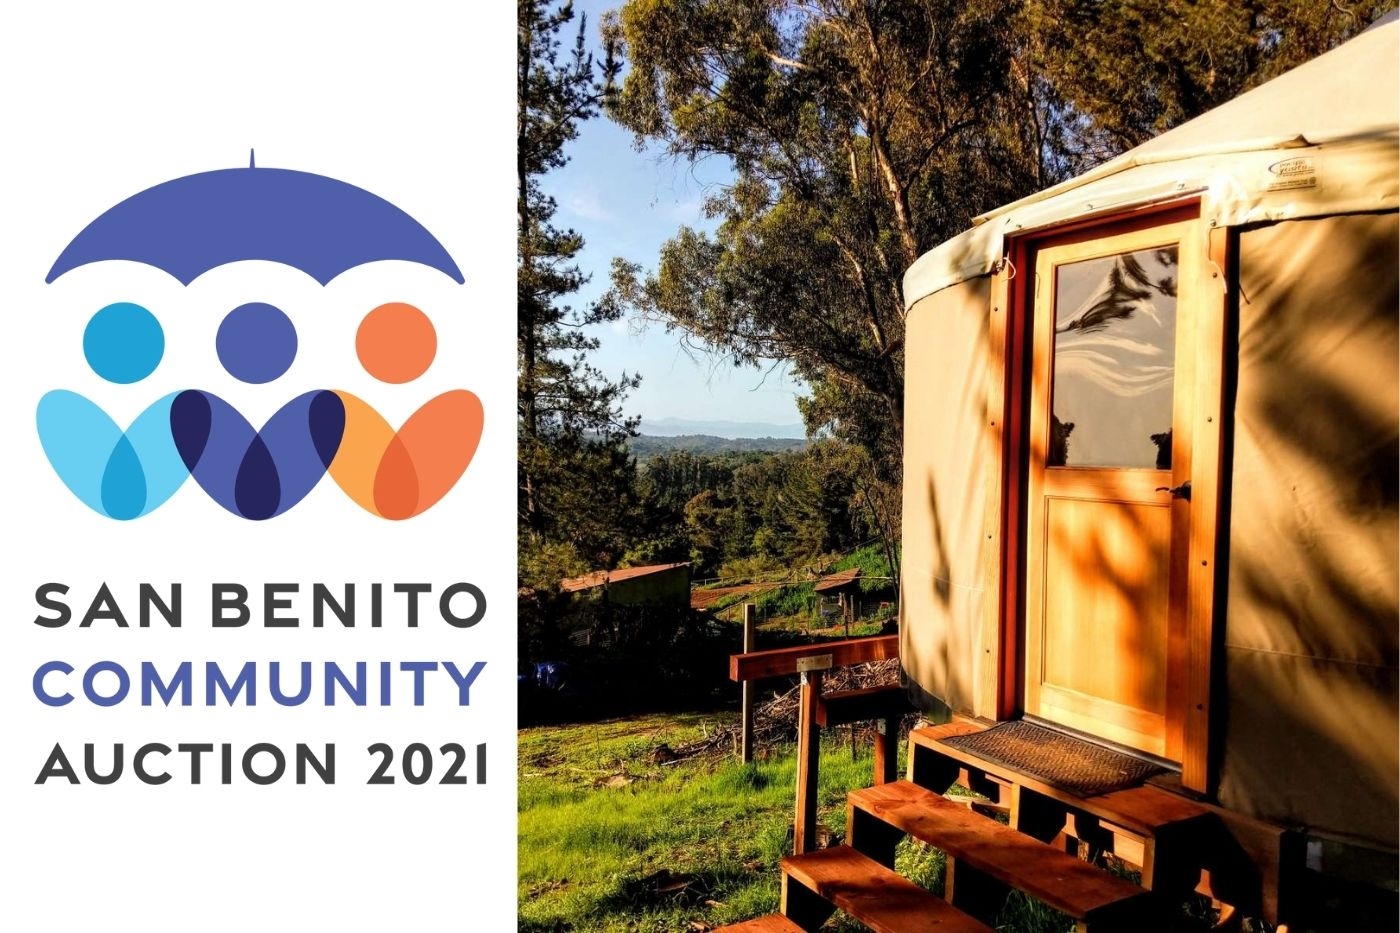 San Benito Community Auction 2021